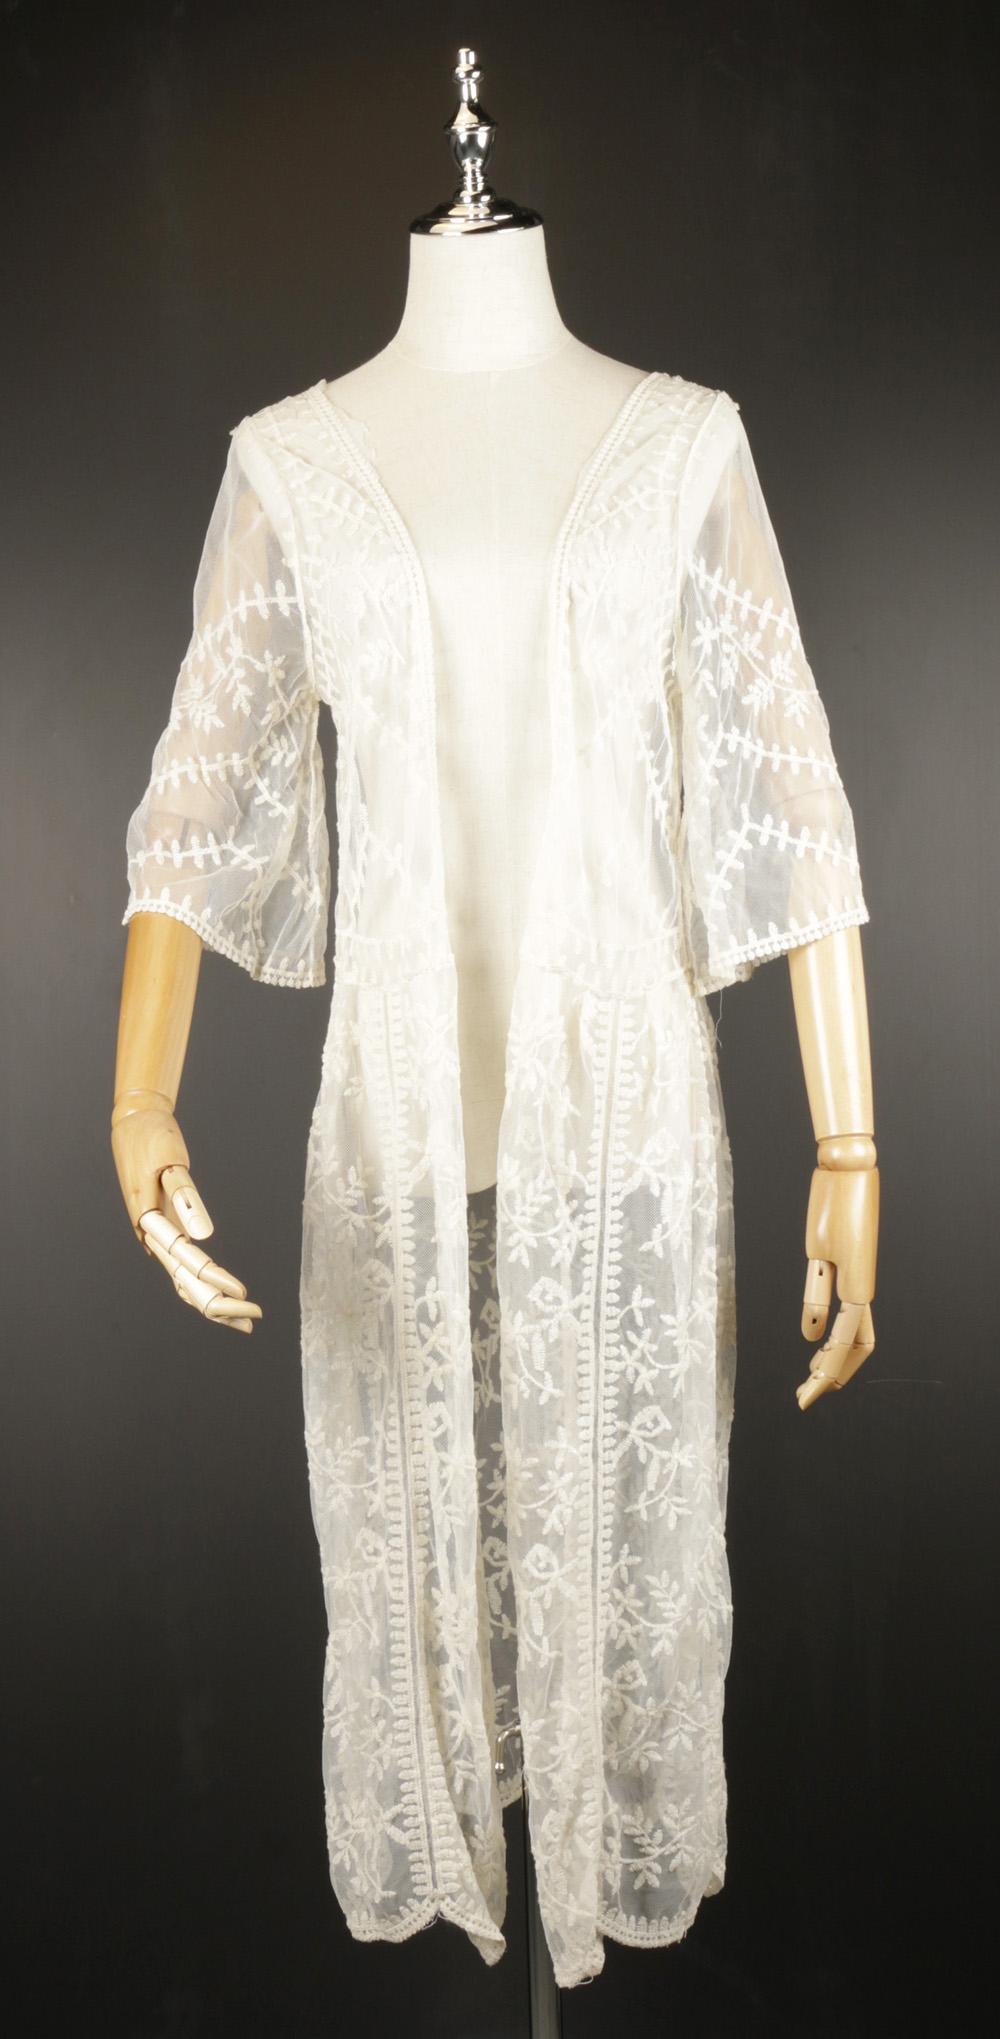 LLC0708 embroidery chiffon outfit